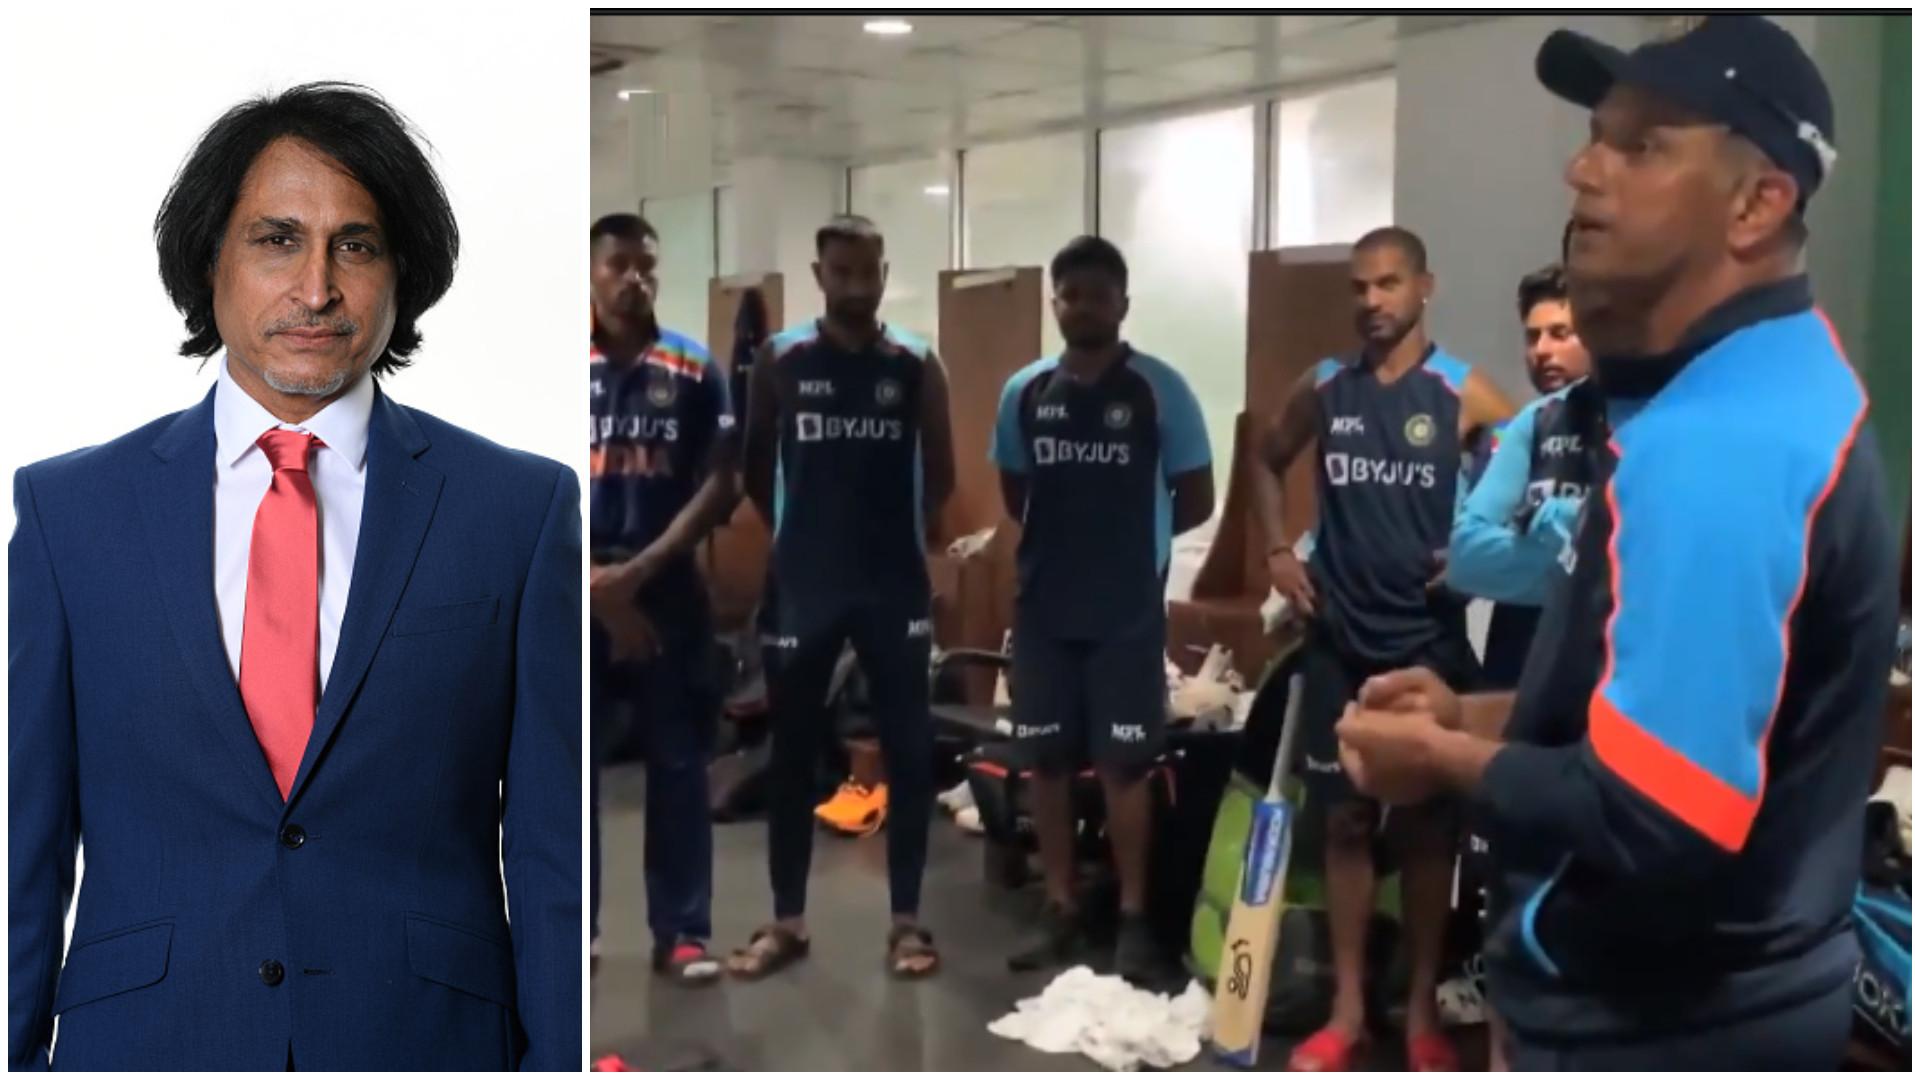 SL v IND 2021: Ramiz Raja lauds coach Rahul Dravid after India's win in 2nd ODI